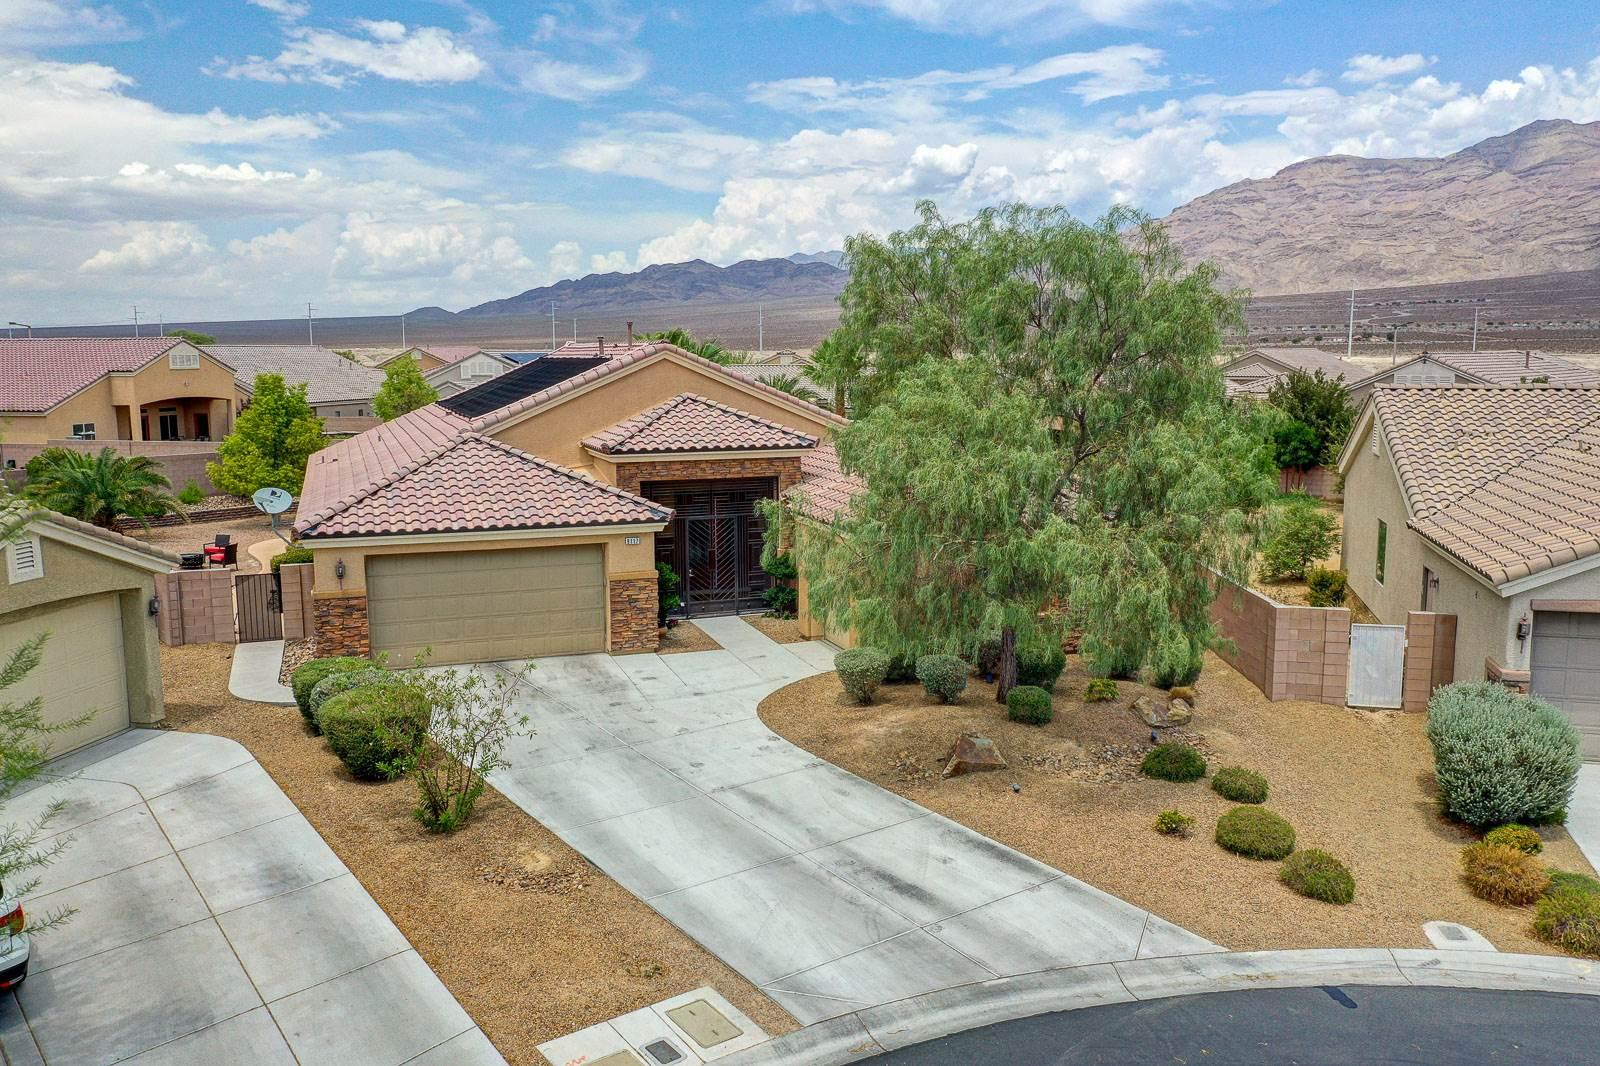 9117 Costa De Oro Court, Las Vegas, NV 89131